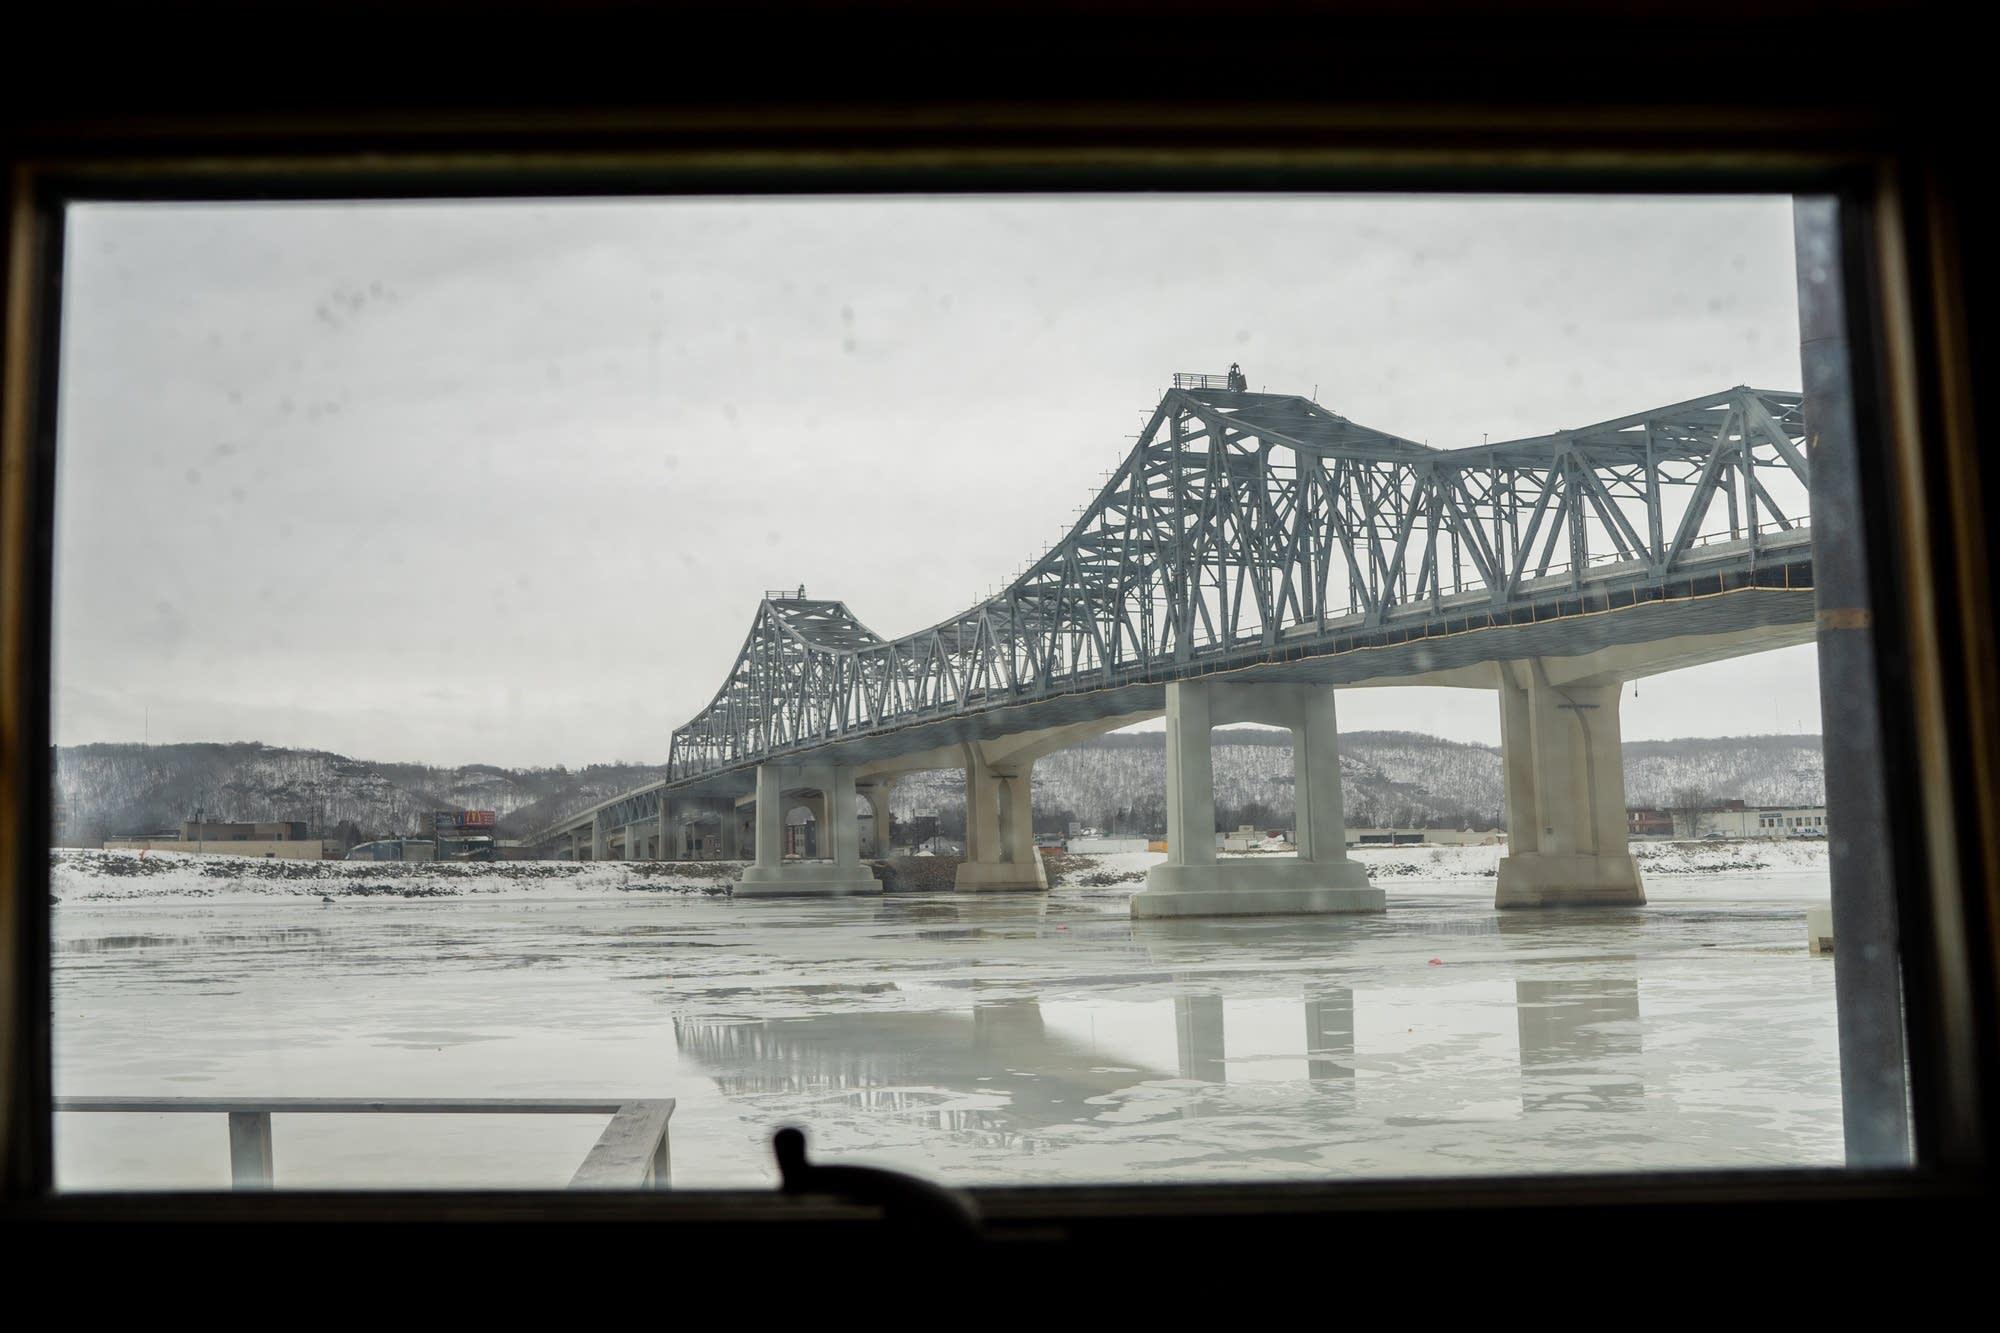 The Winona bridge is seen from the 2nd floor of Doug Johnson's houseboat.